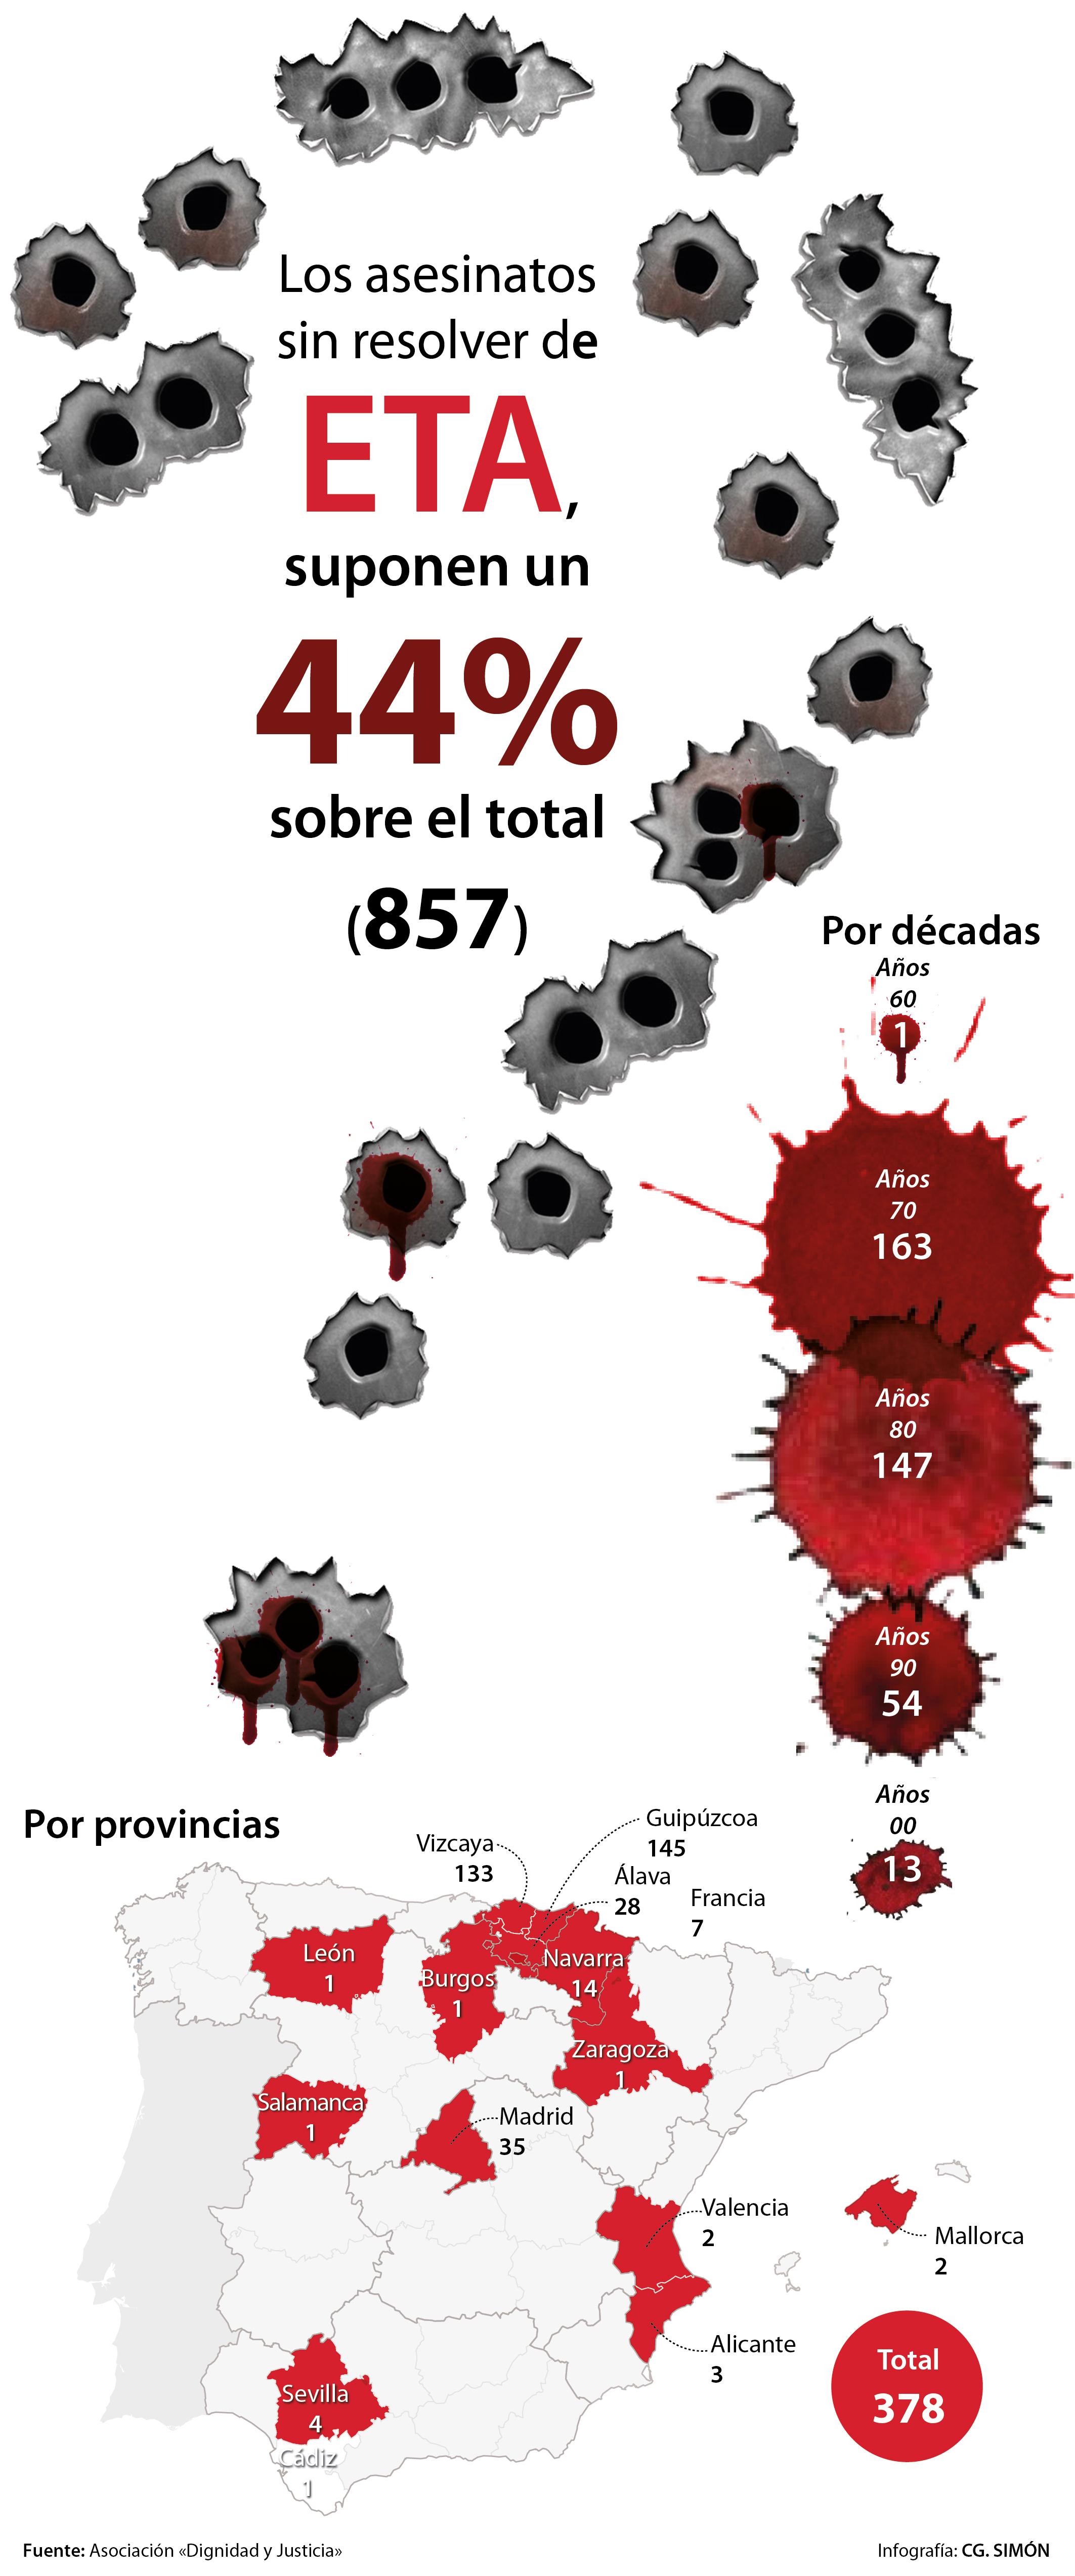 [Imagen: asesinatos-sinresolver-ETA-510x1220.jpg]